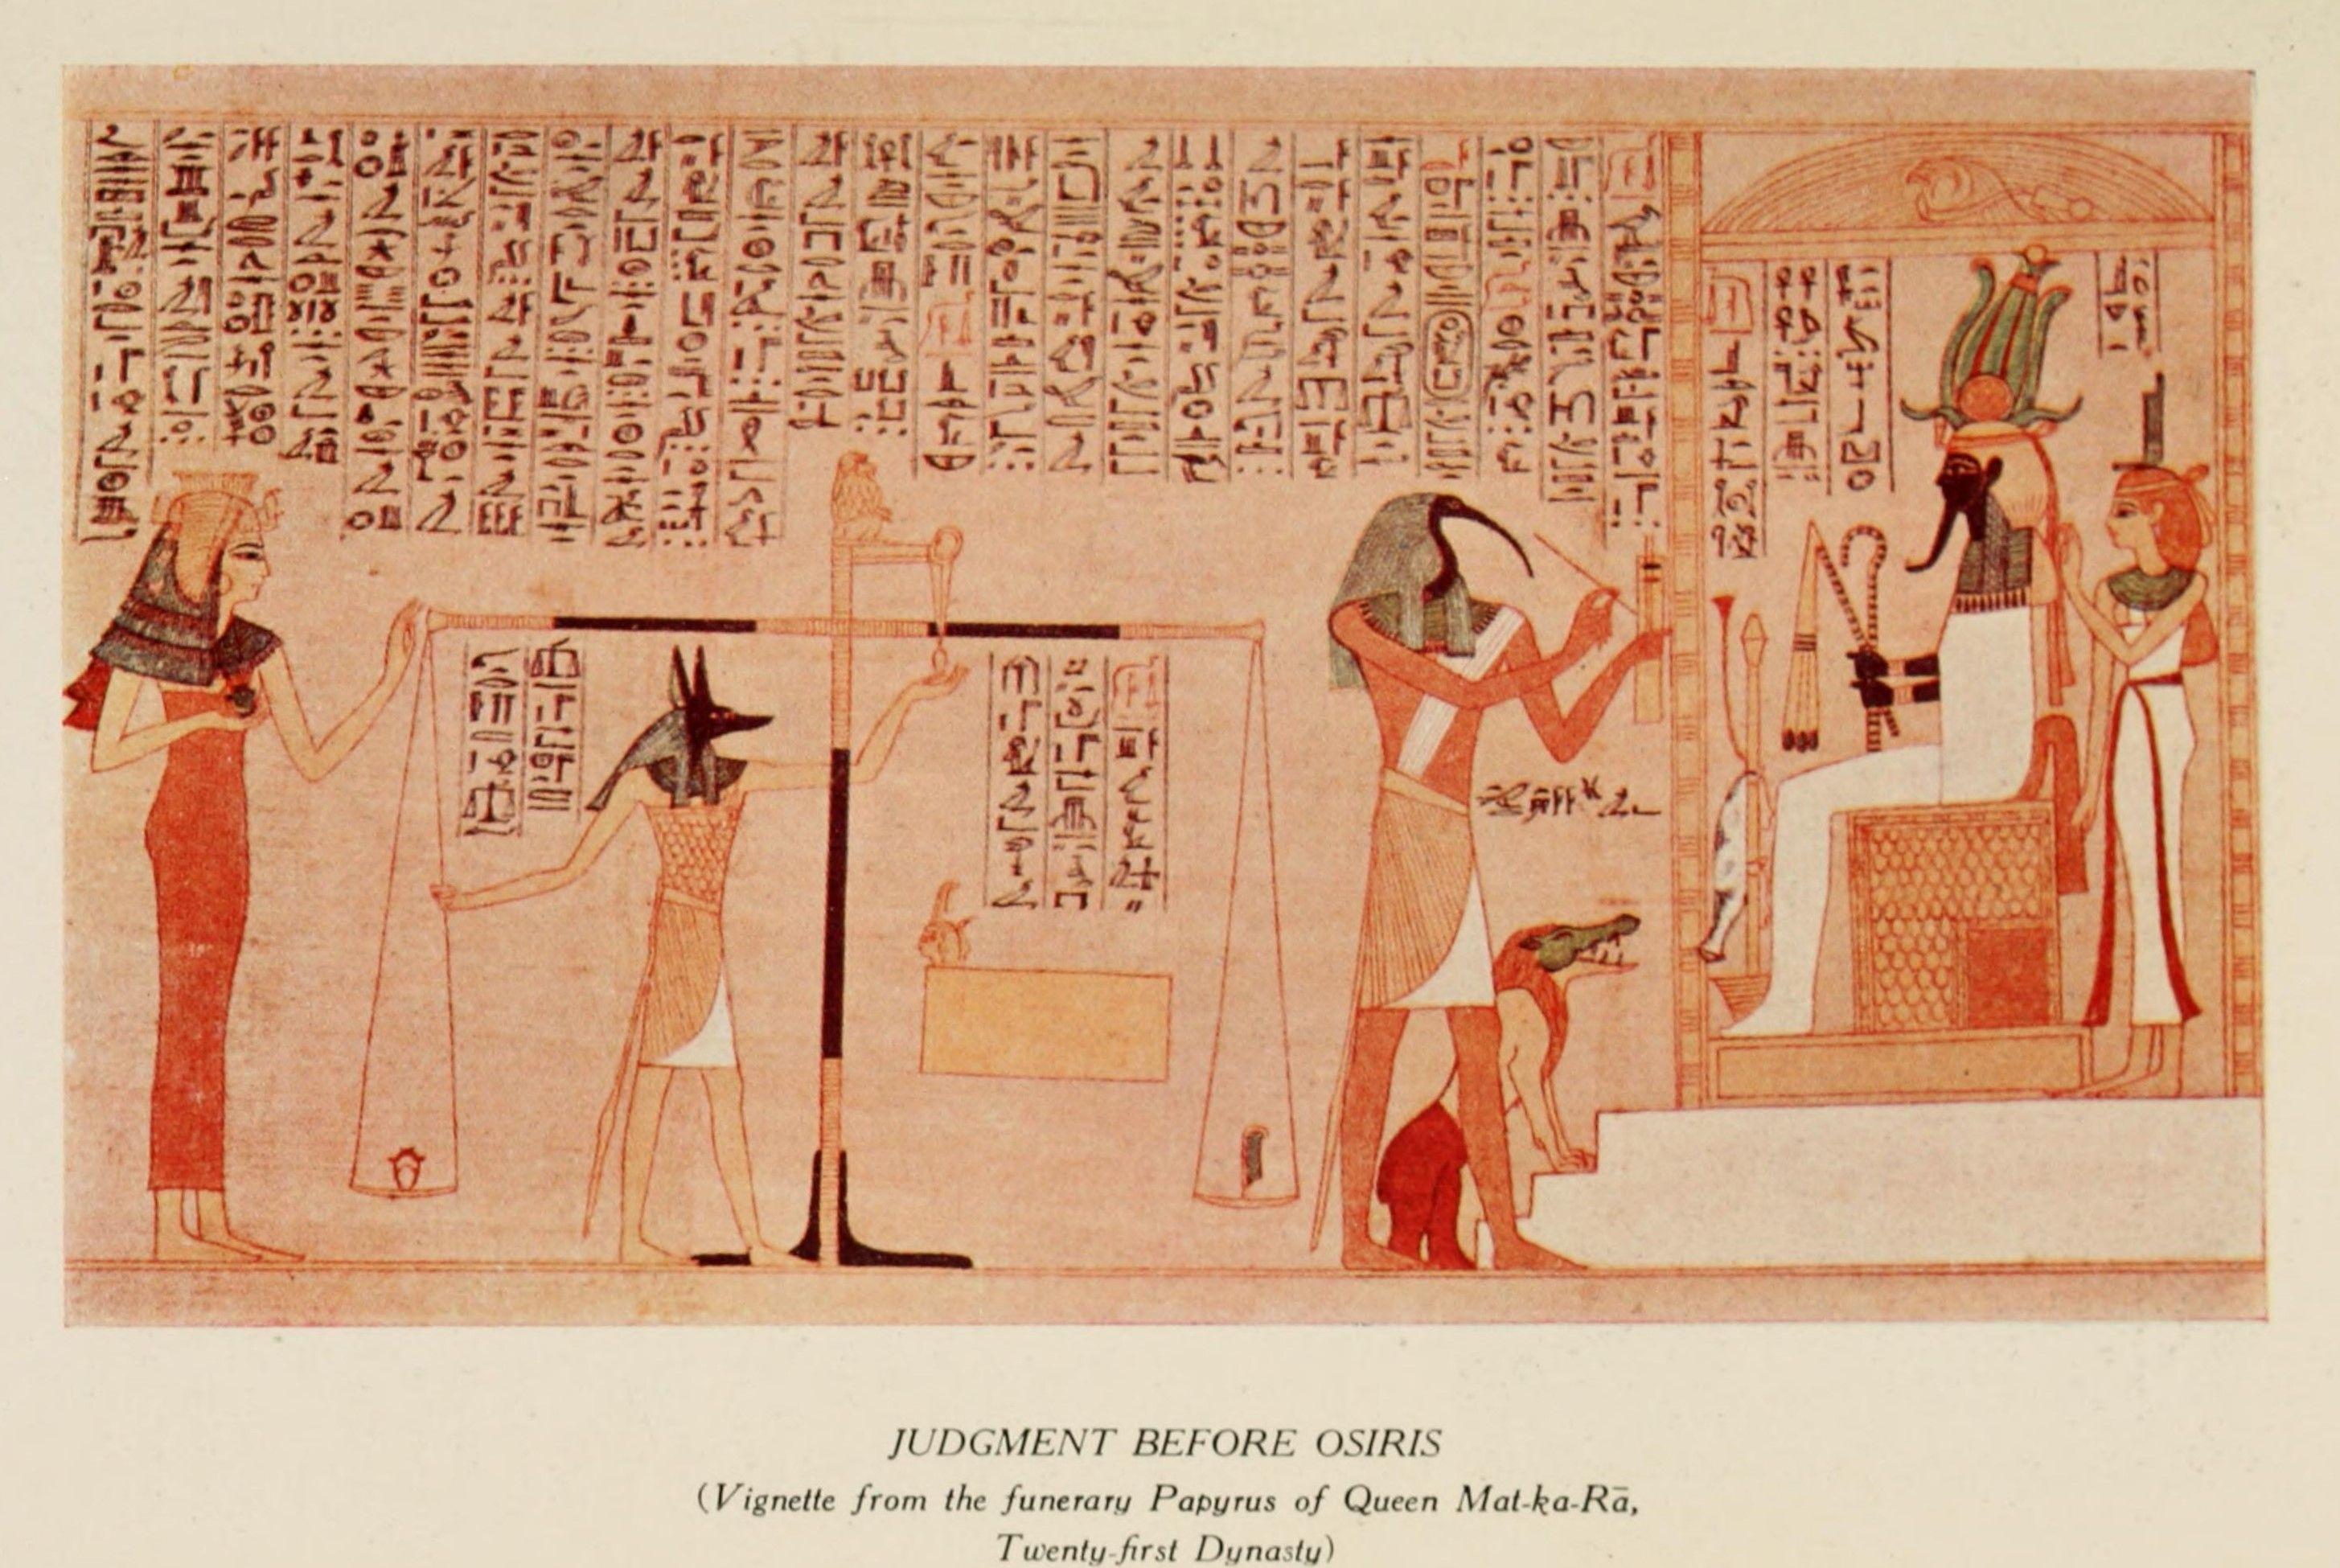 Ancient - Art in Egypt 1912, Judgement before Osiris. #egypt  Judgement Before Osiris